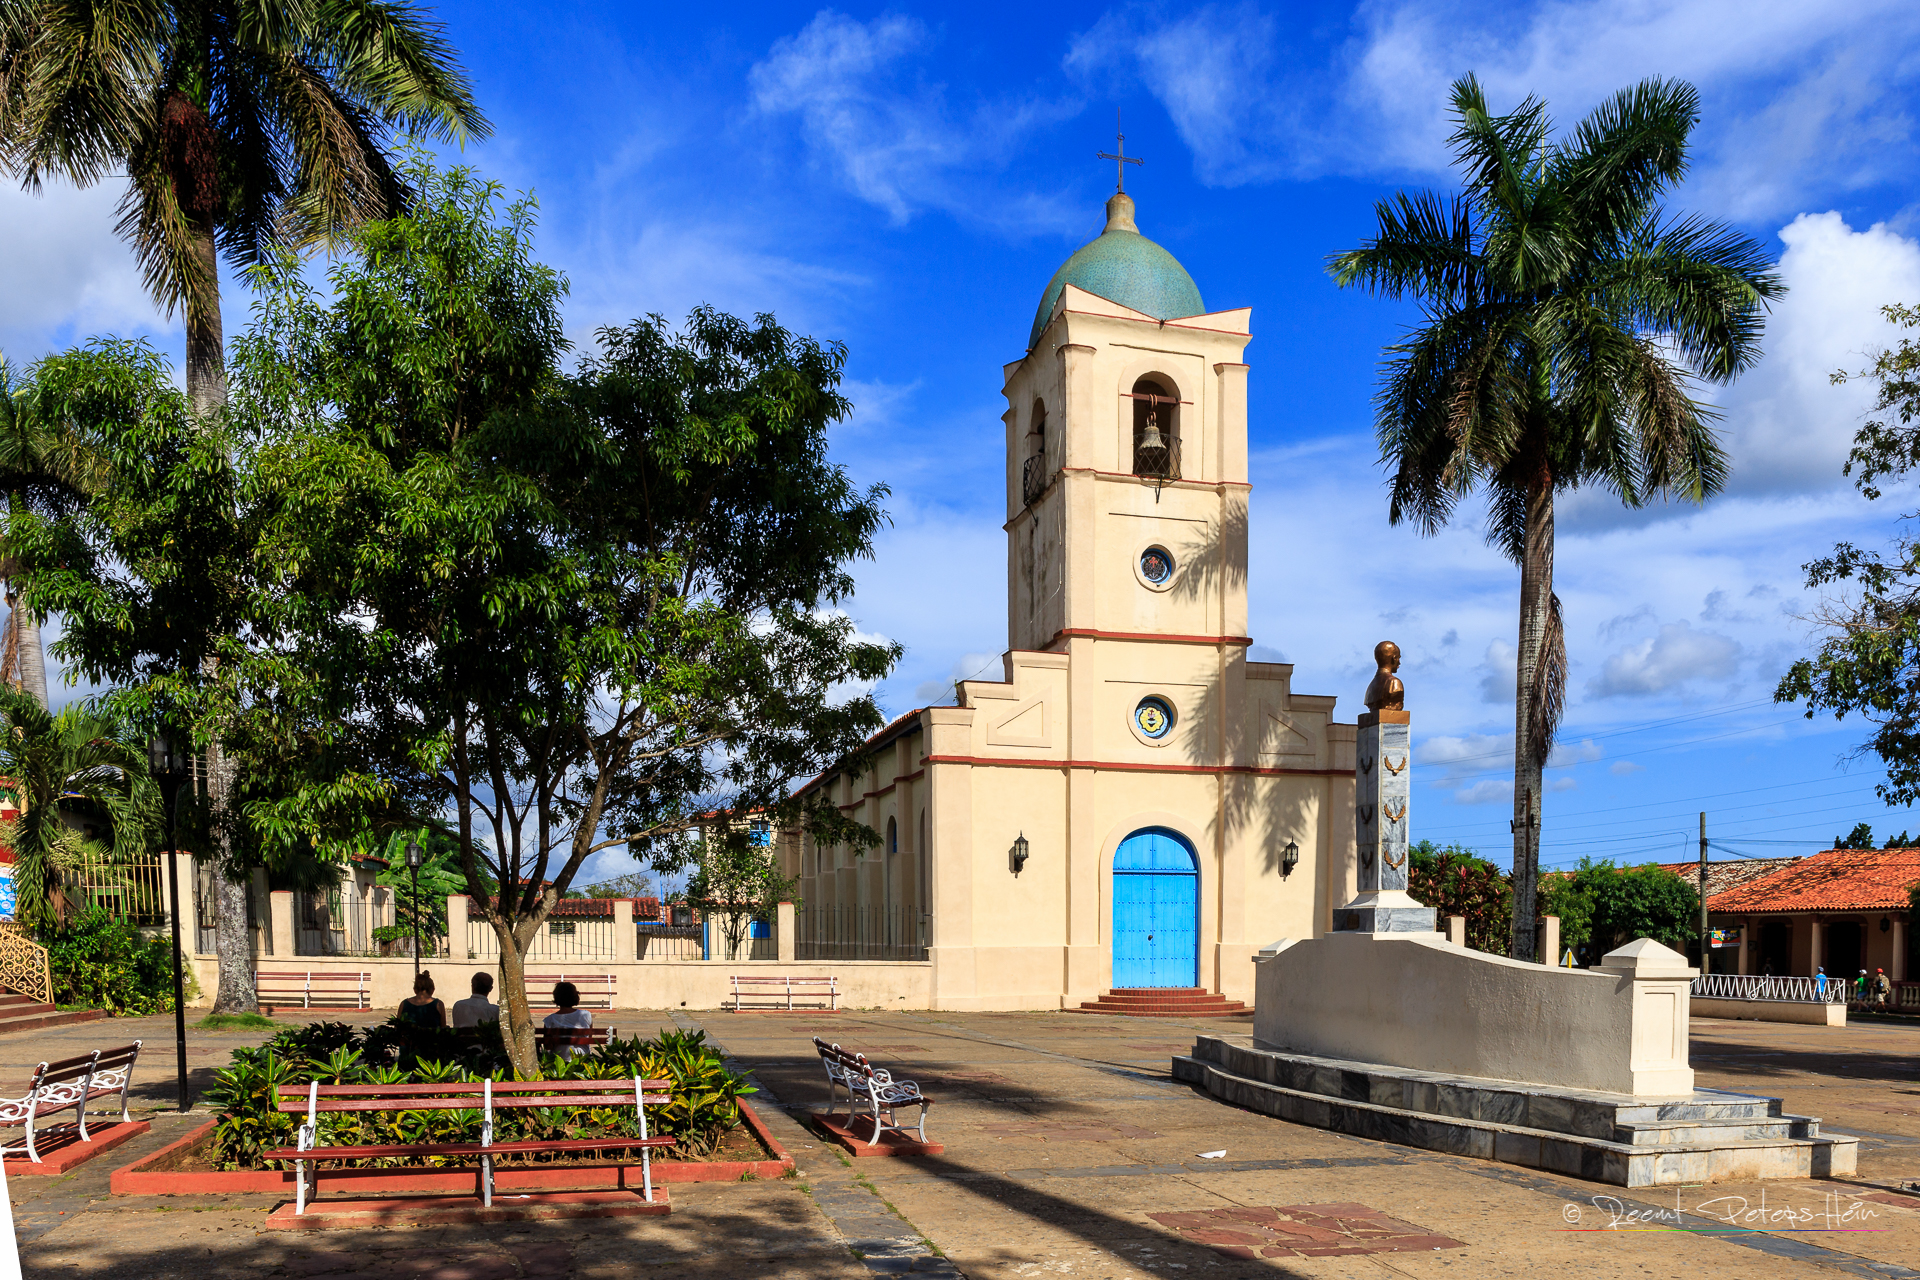 Church and main square of Vinales, Cuba